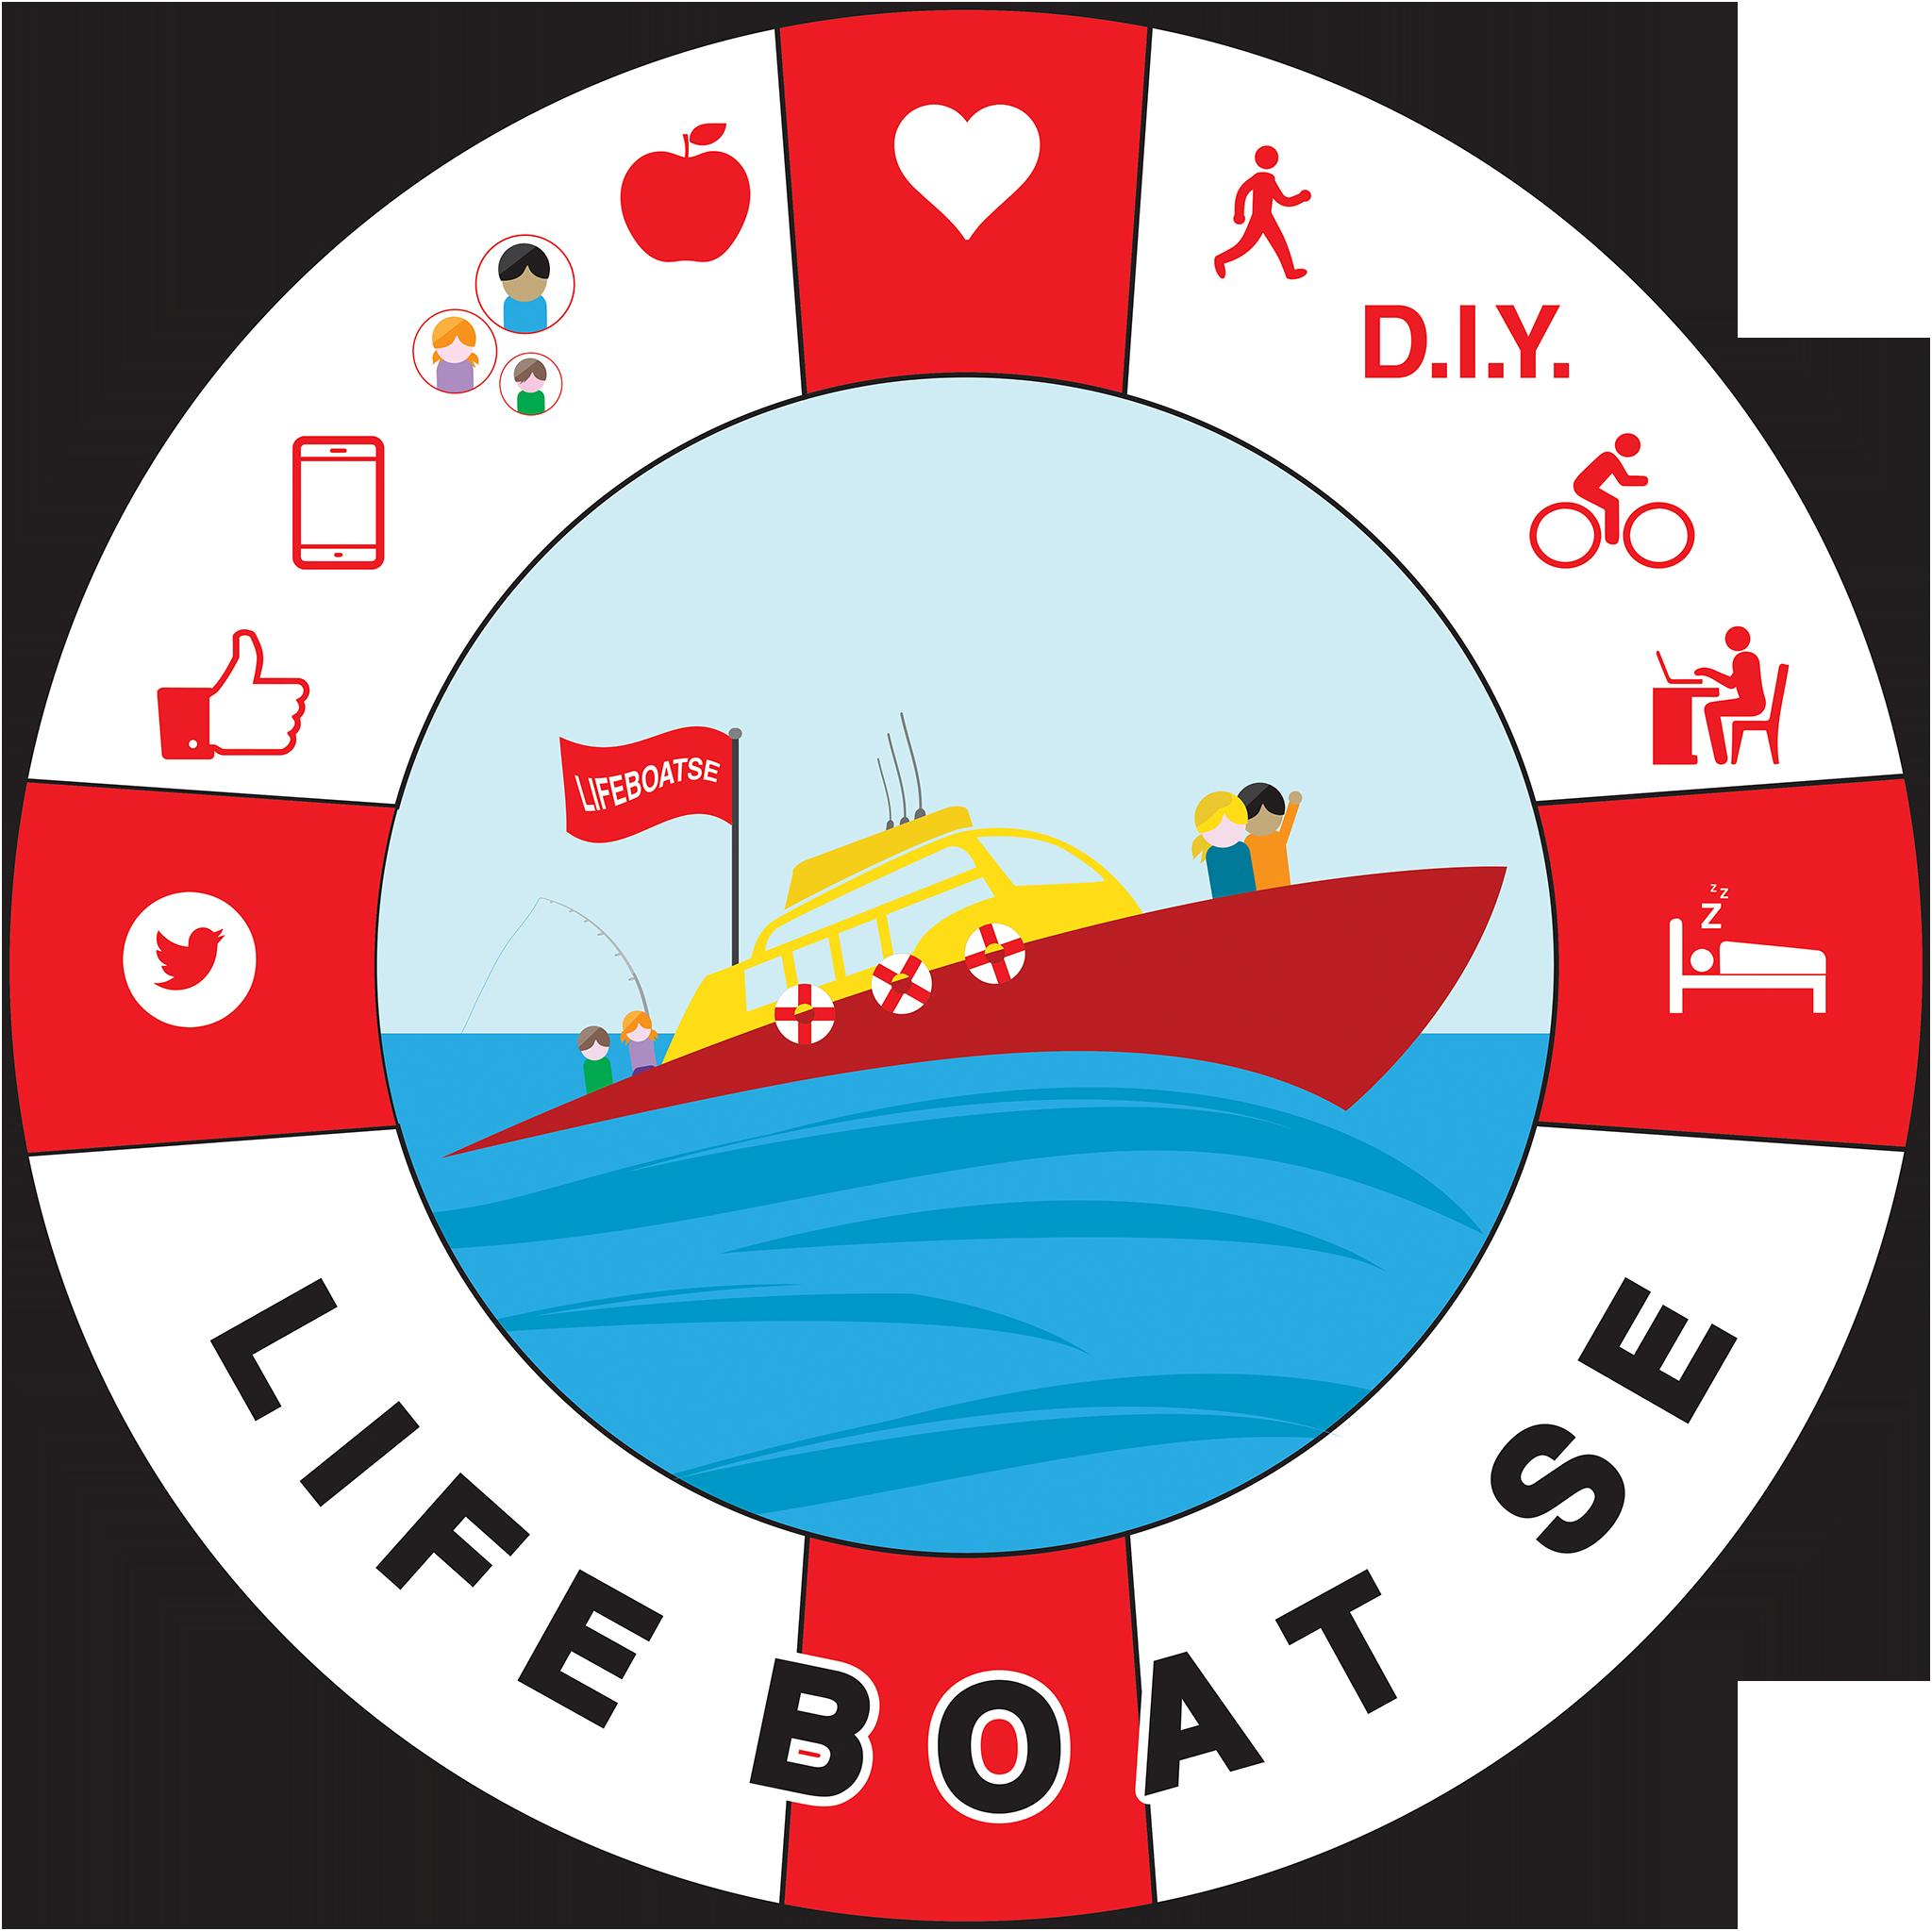 Lifeboat logo final copy.png